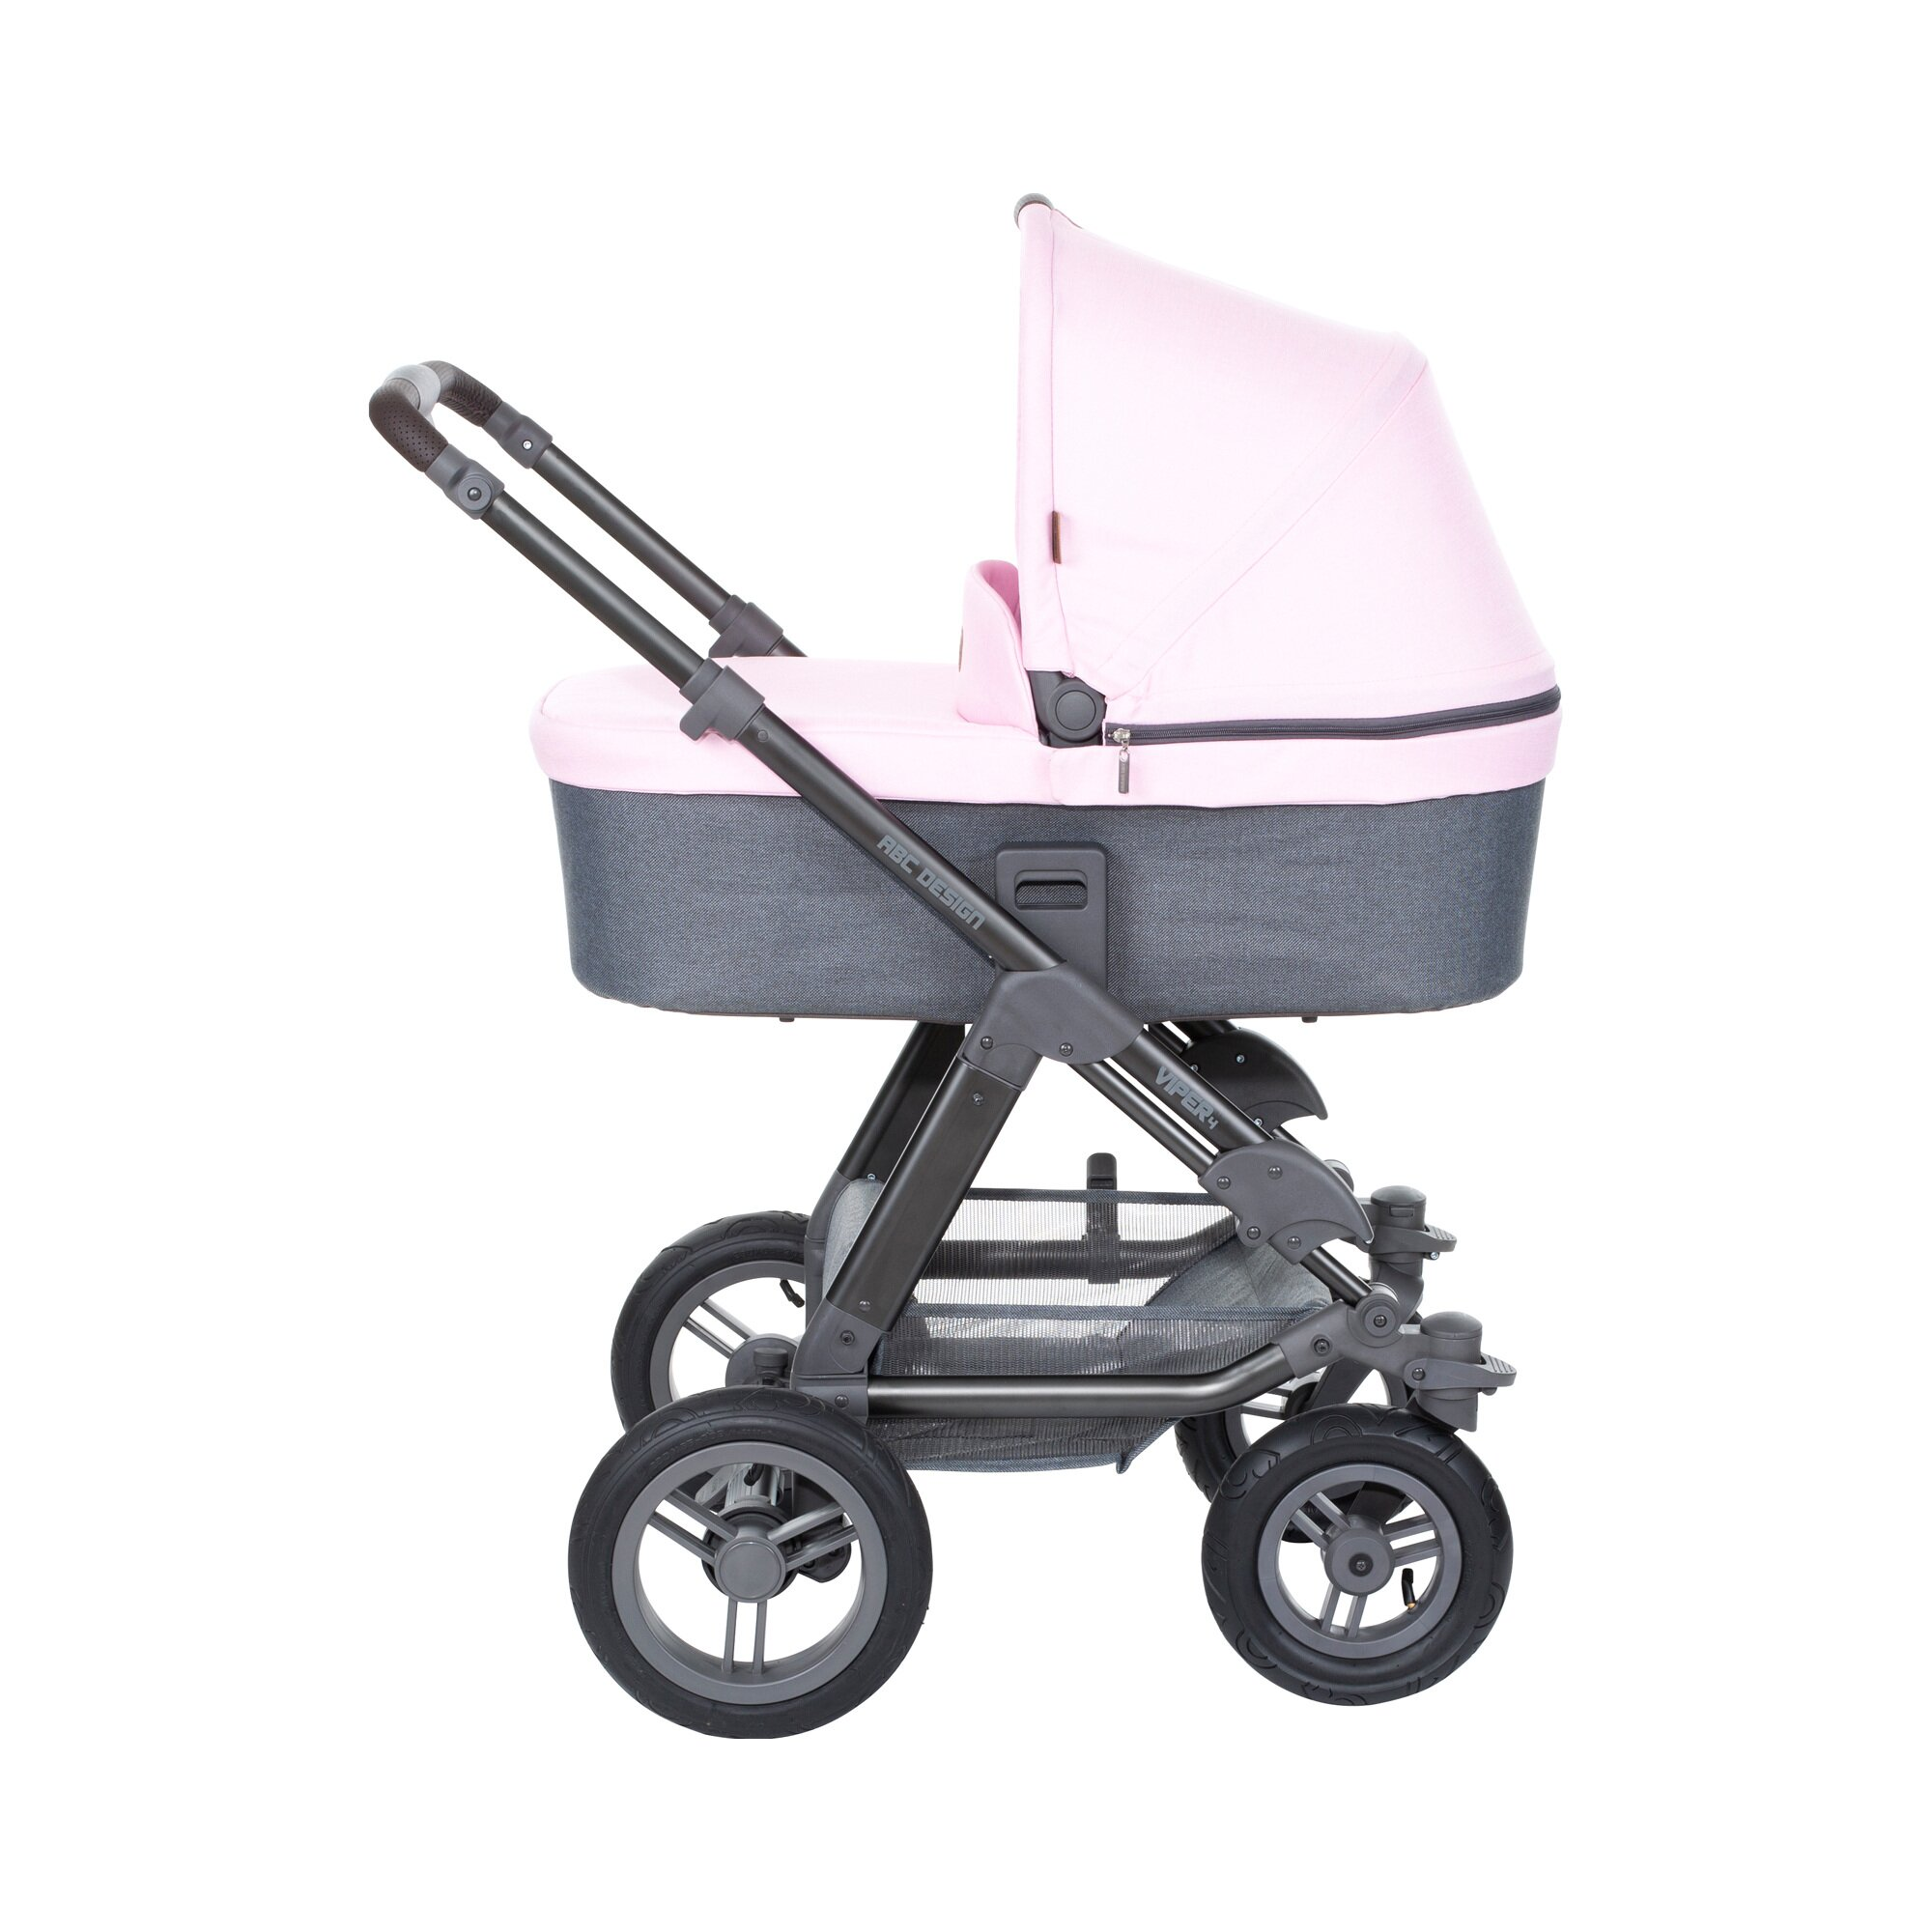 viper-4-kombikinderwagen-rosa